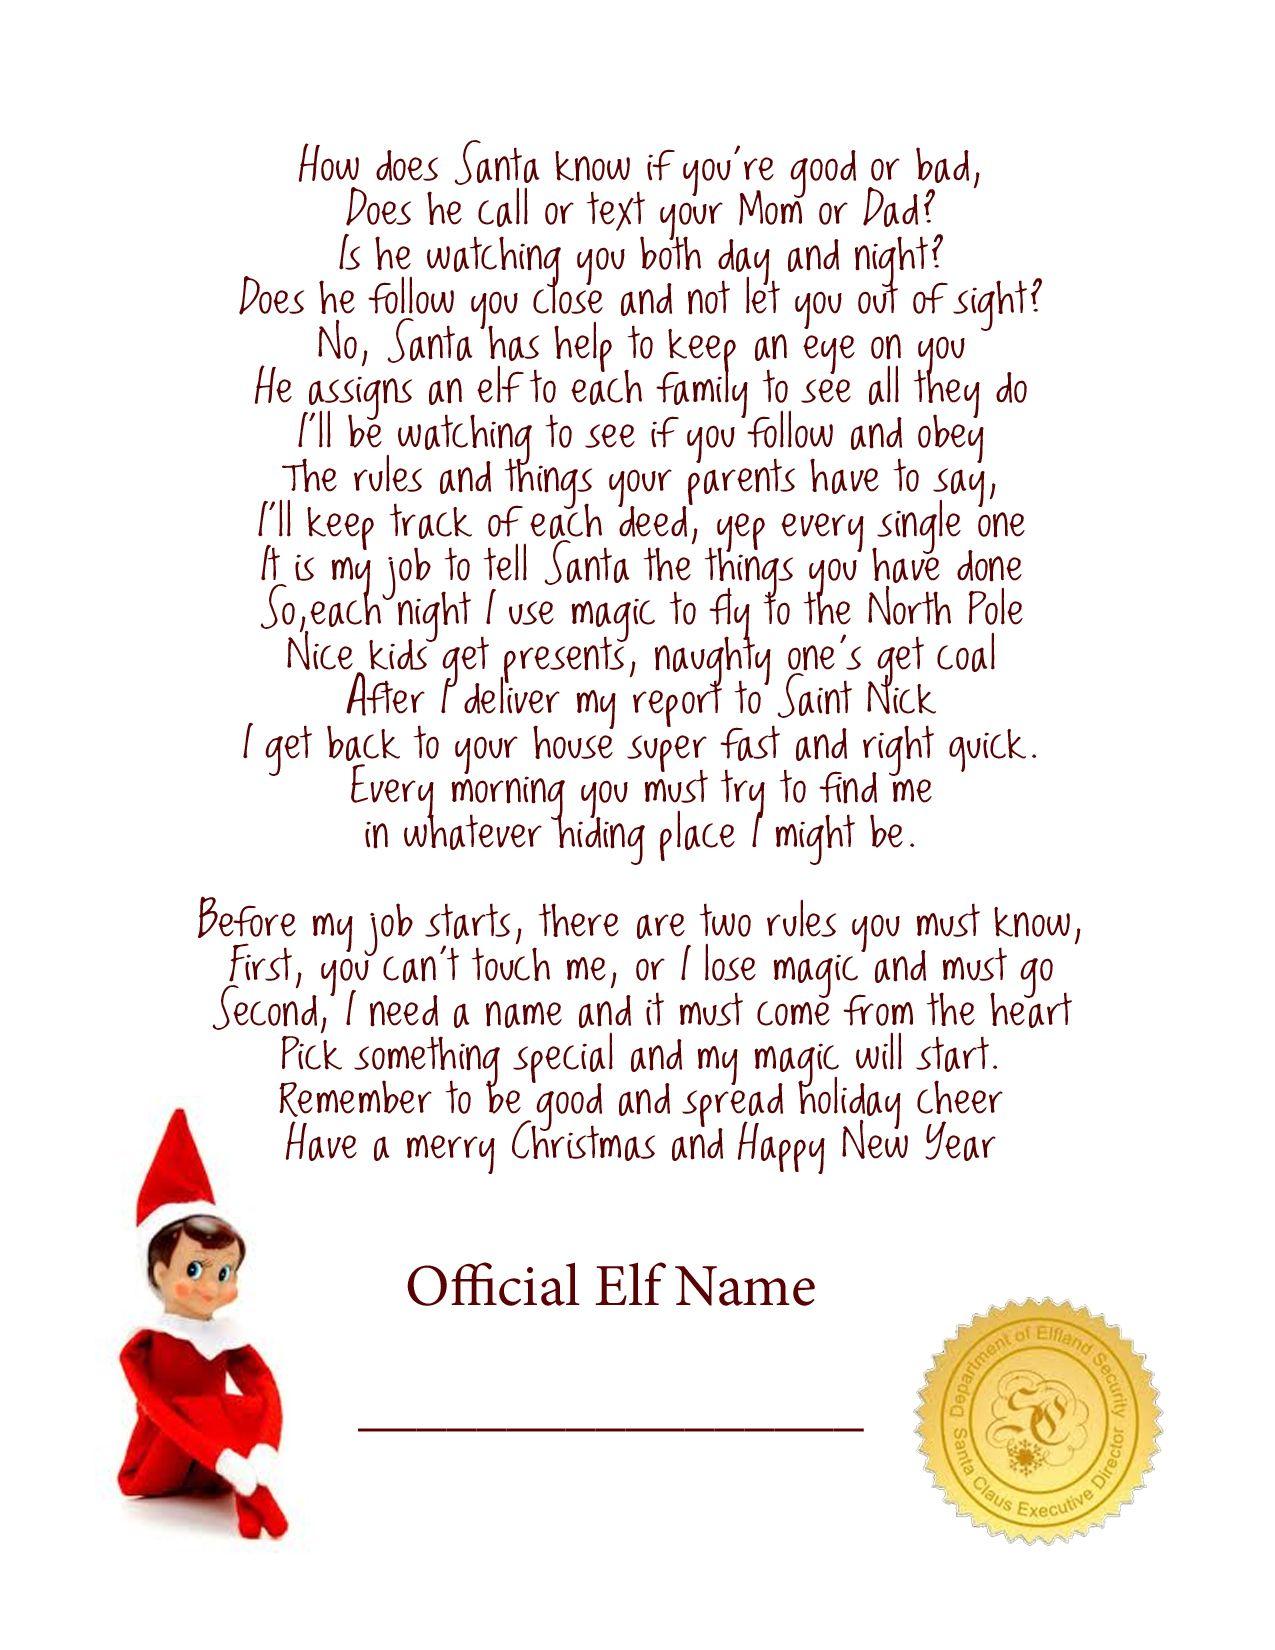 Elf On The Shelf Story - Free Printable Poem | Elf On The Shelf - Free Printable Elf On Shelf Arrival Letter